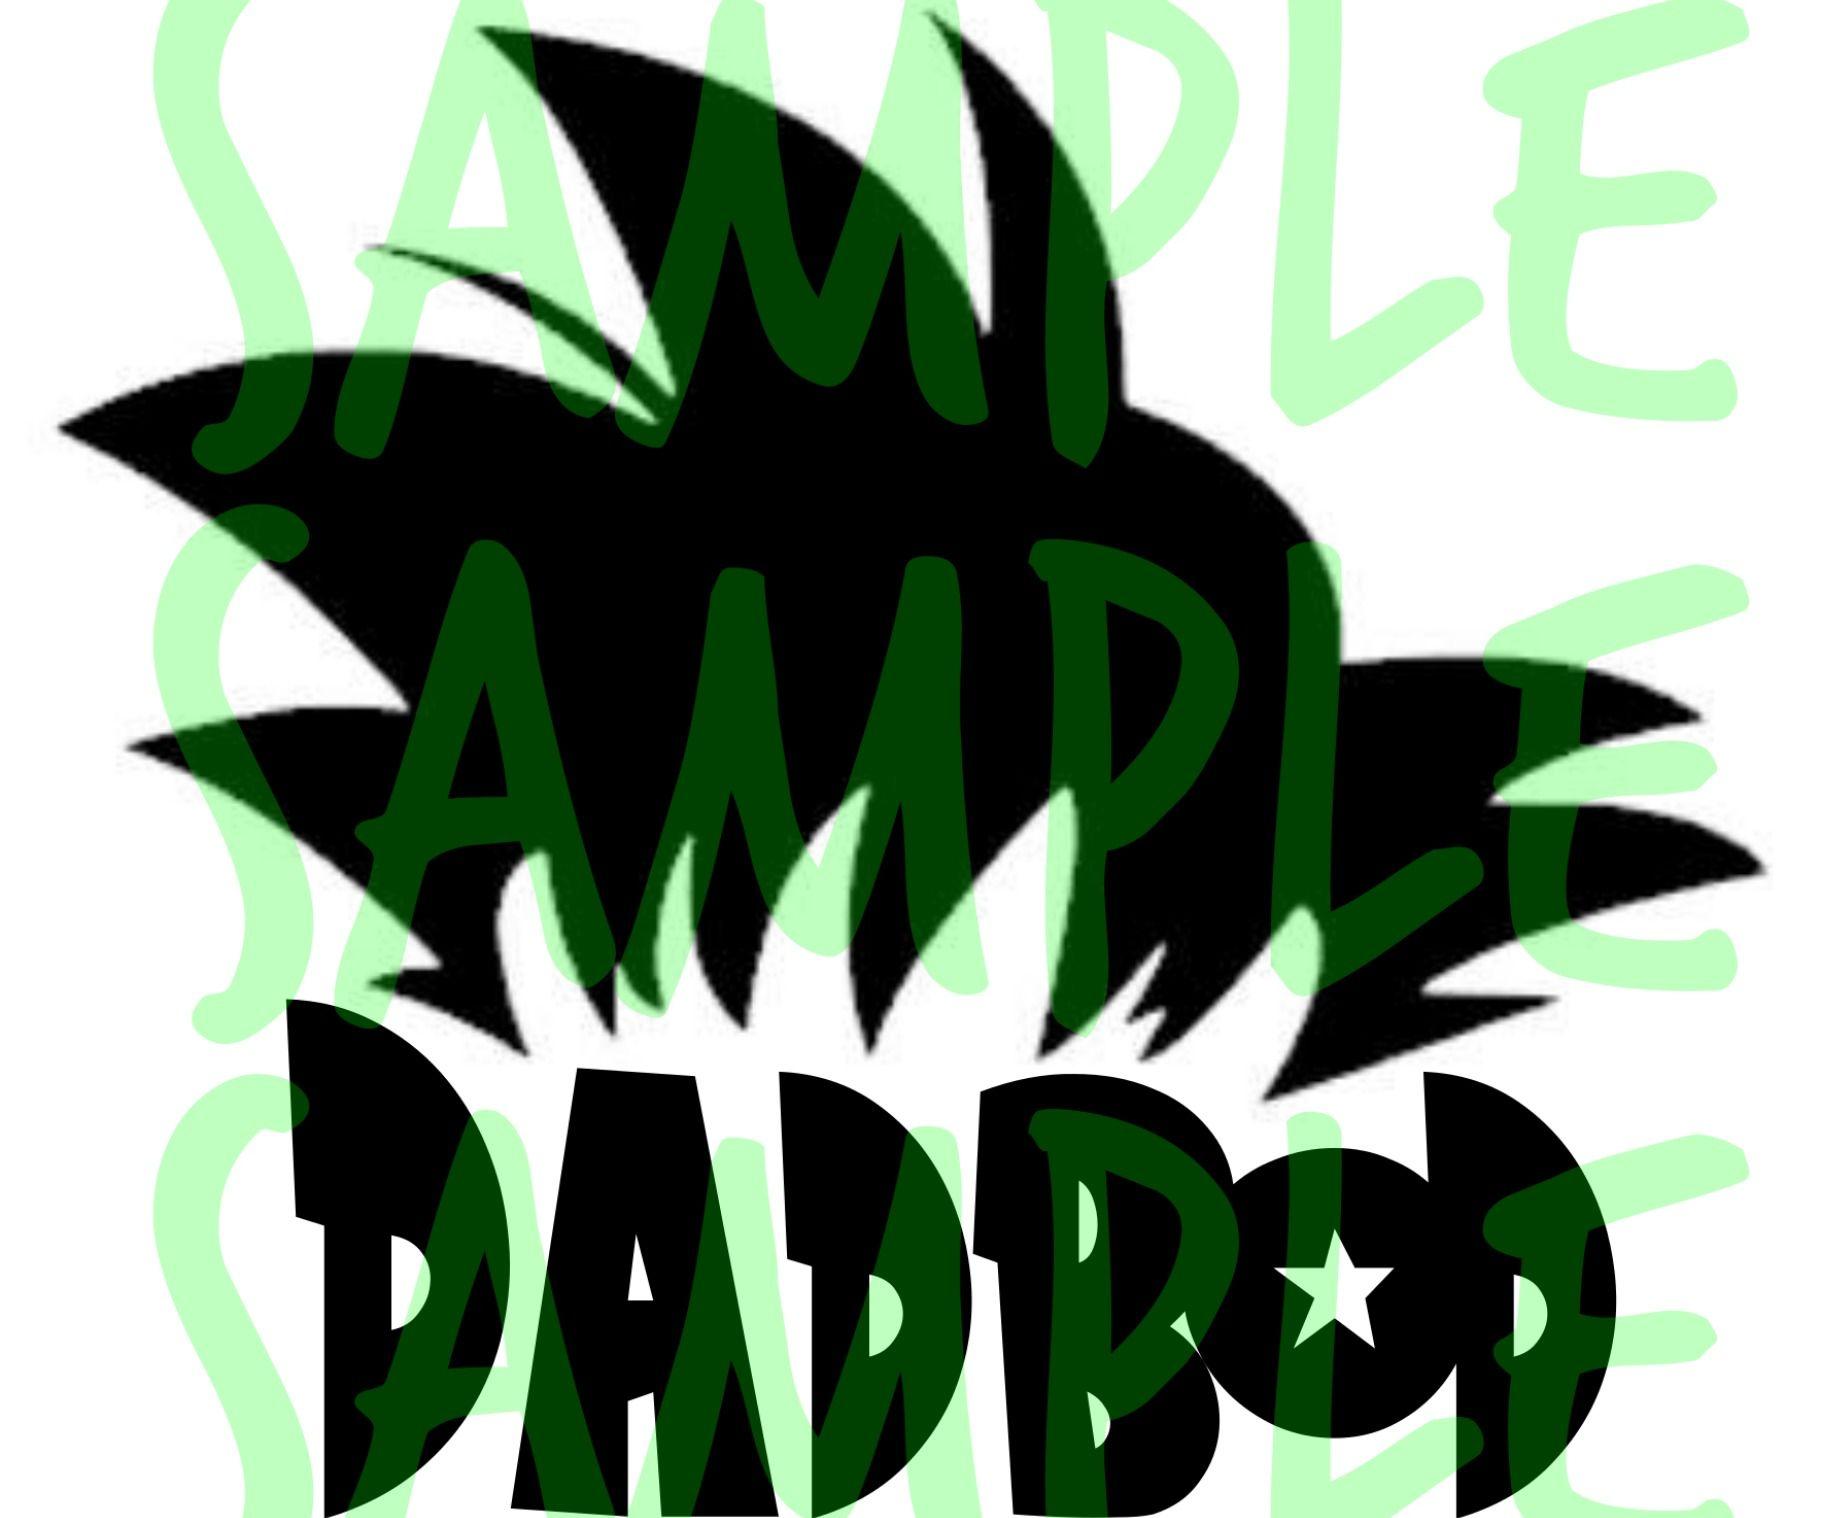 Goku Hair Dadbod Png Svg Dxf Eps Instant Digital Etsy Goku Hair Tumbler Decal Dad Bod